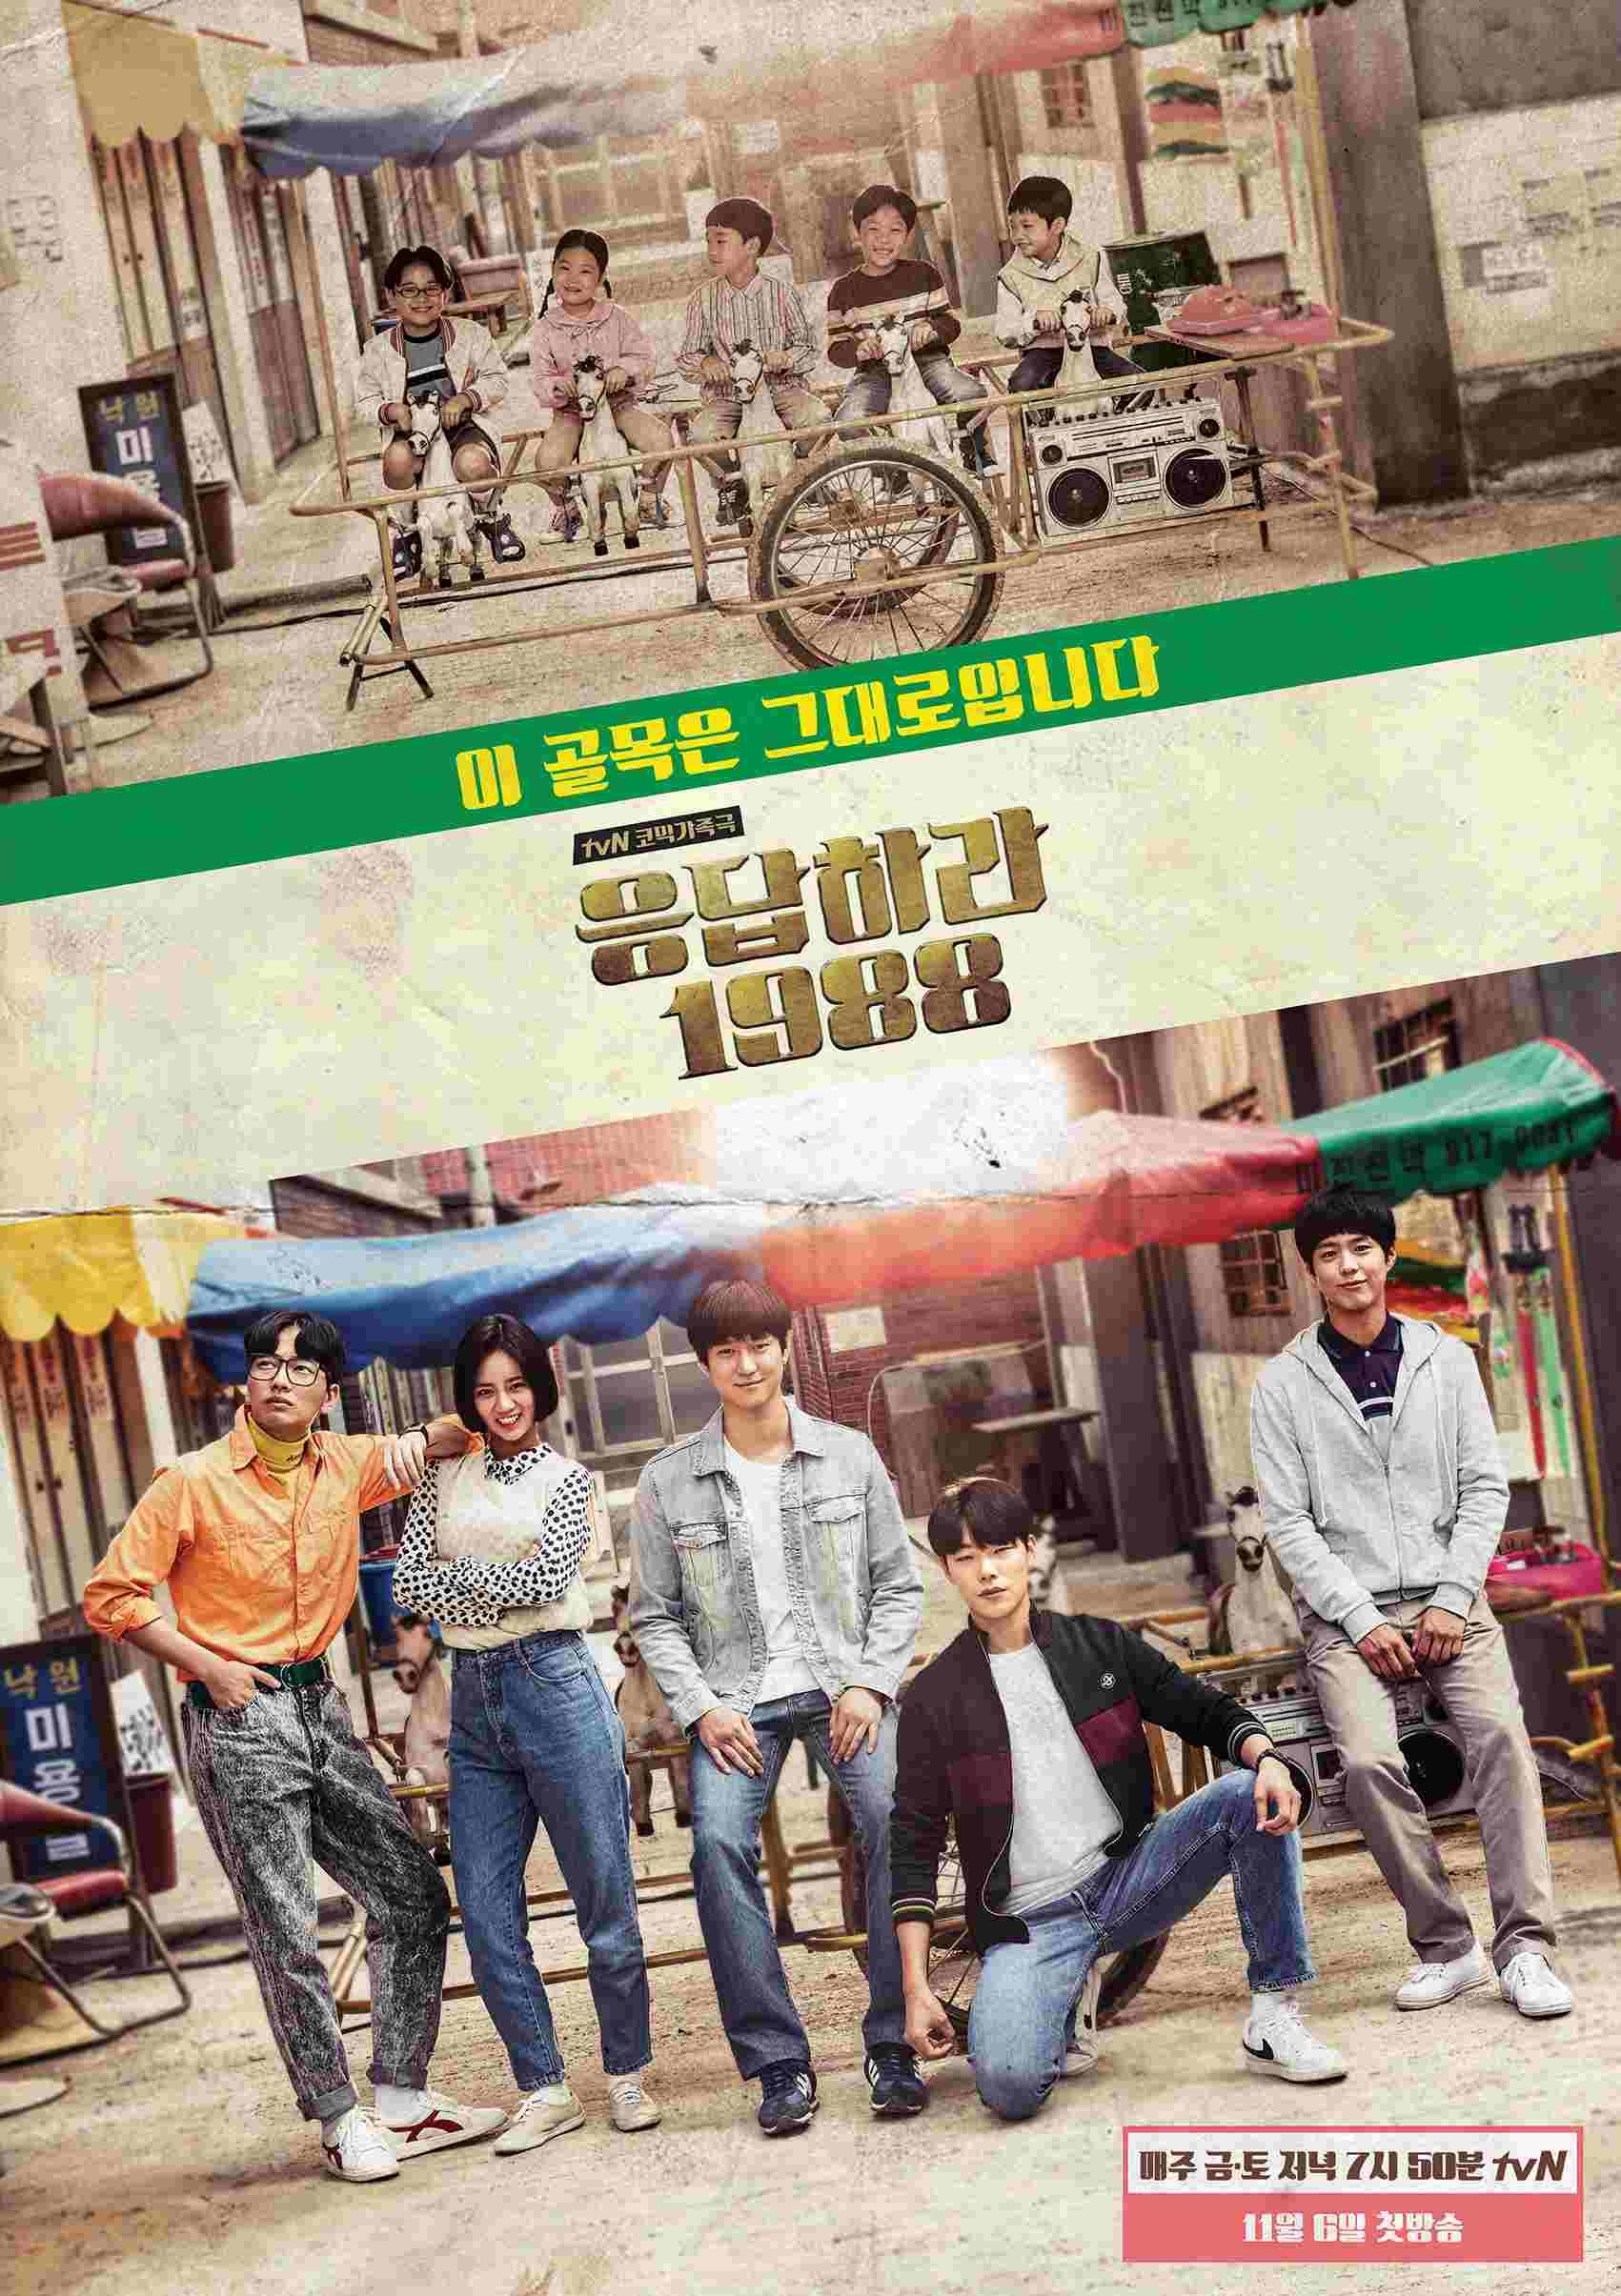 5位 tvN《請回答1988》: 258200分